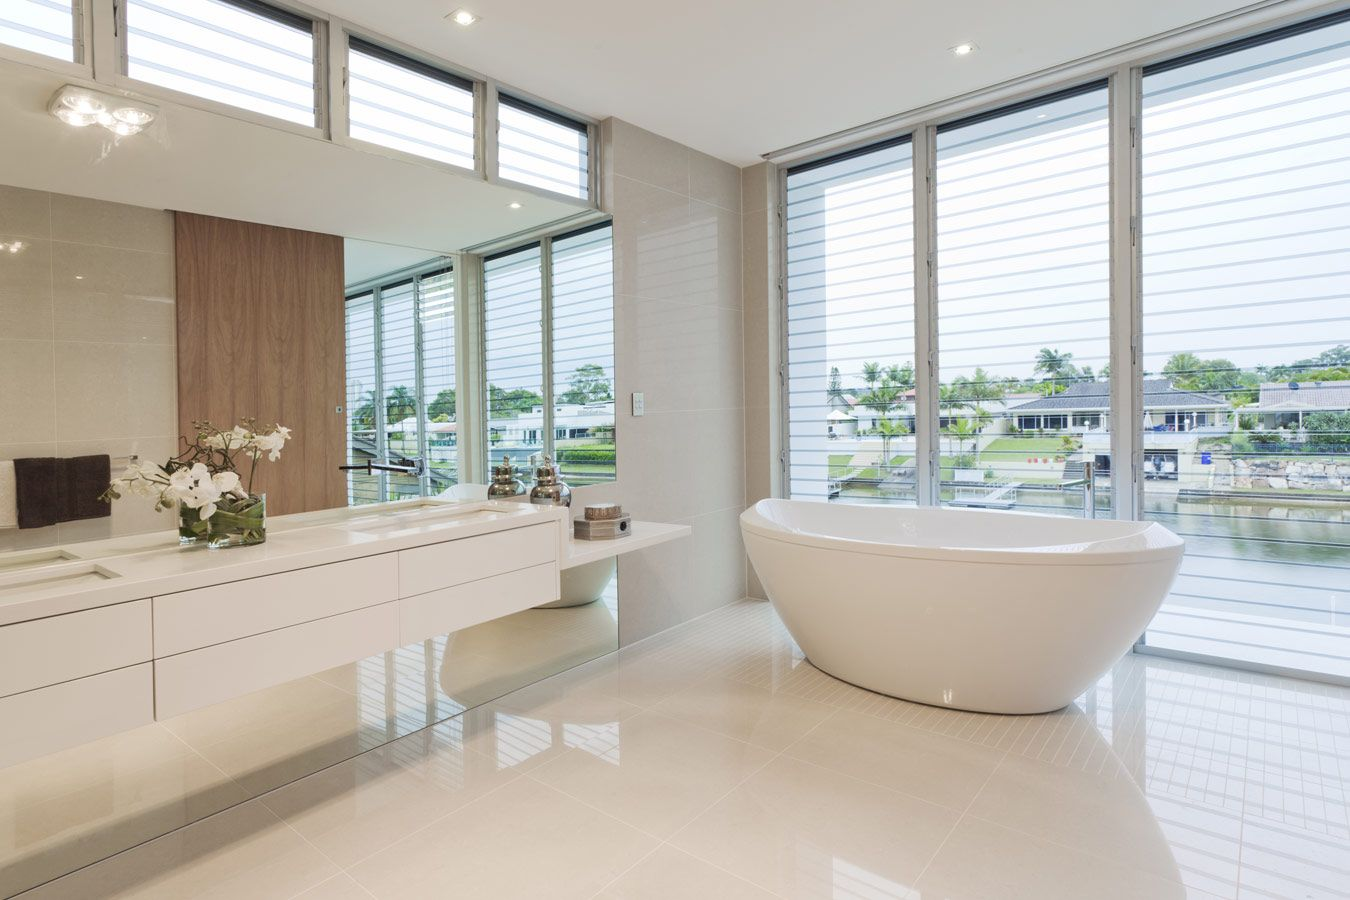 Moderne Witte Badkamer : Moderne witte badkamer met grote spiegel badkamers pinterest